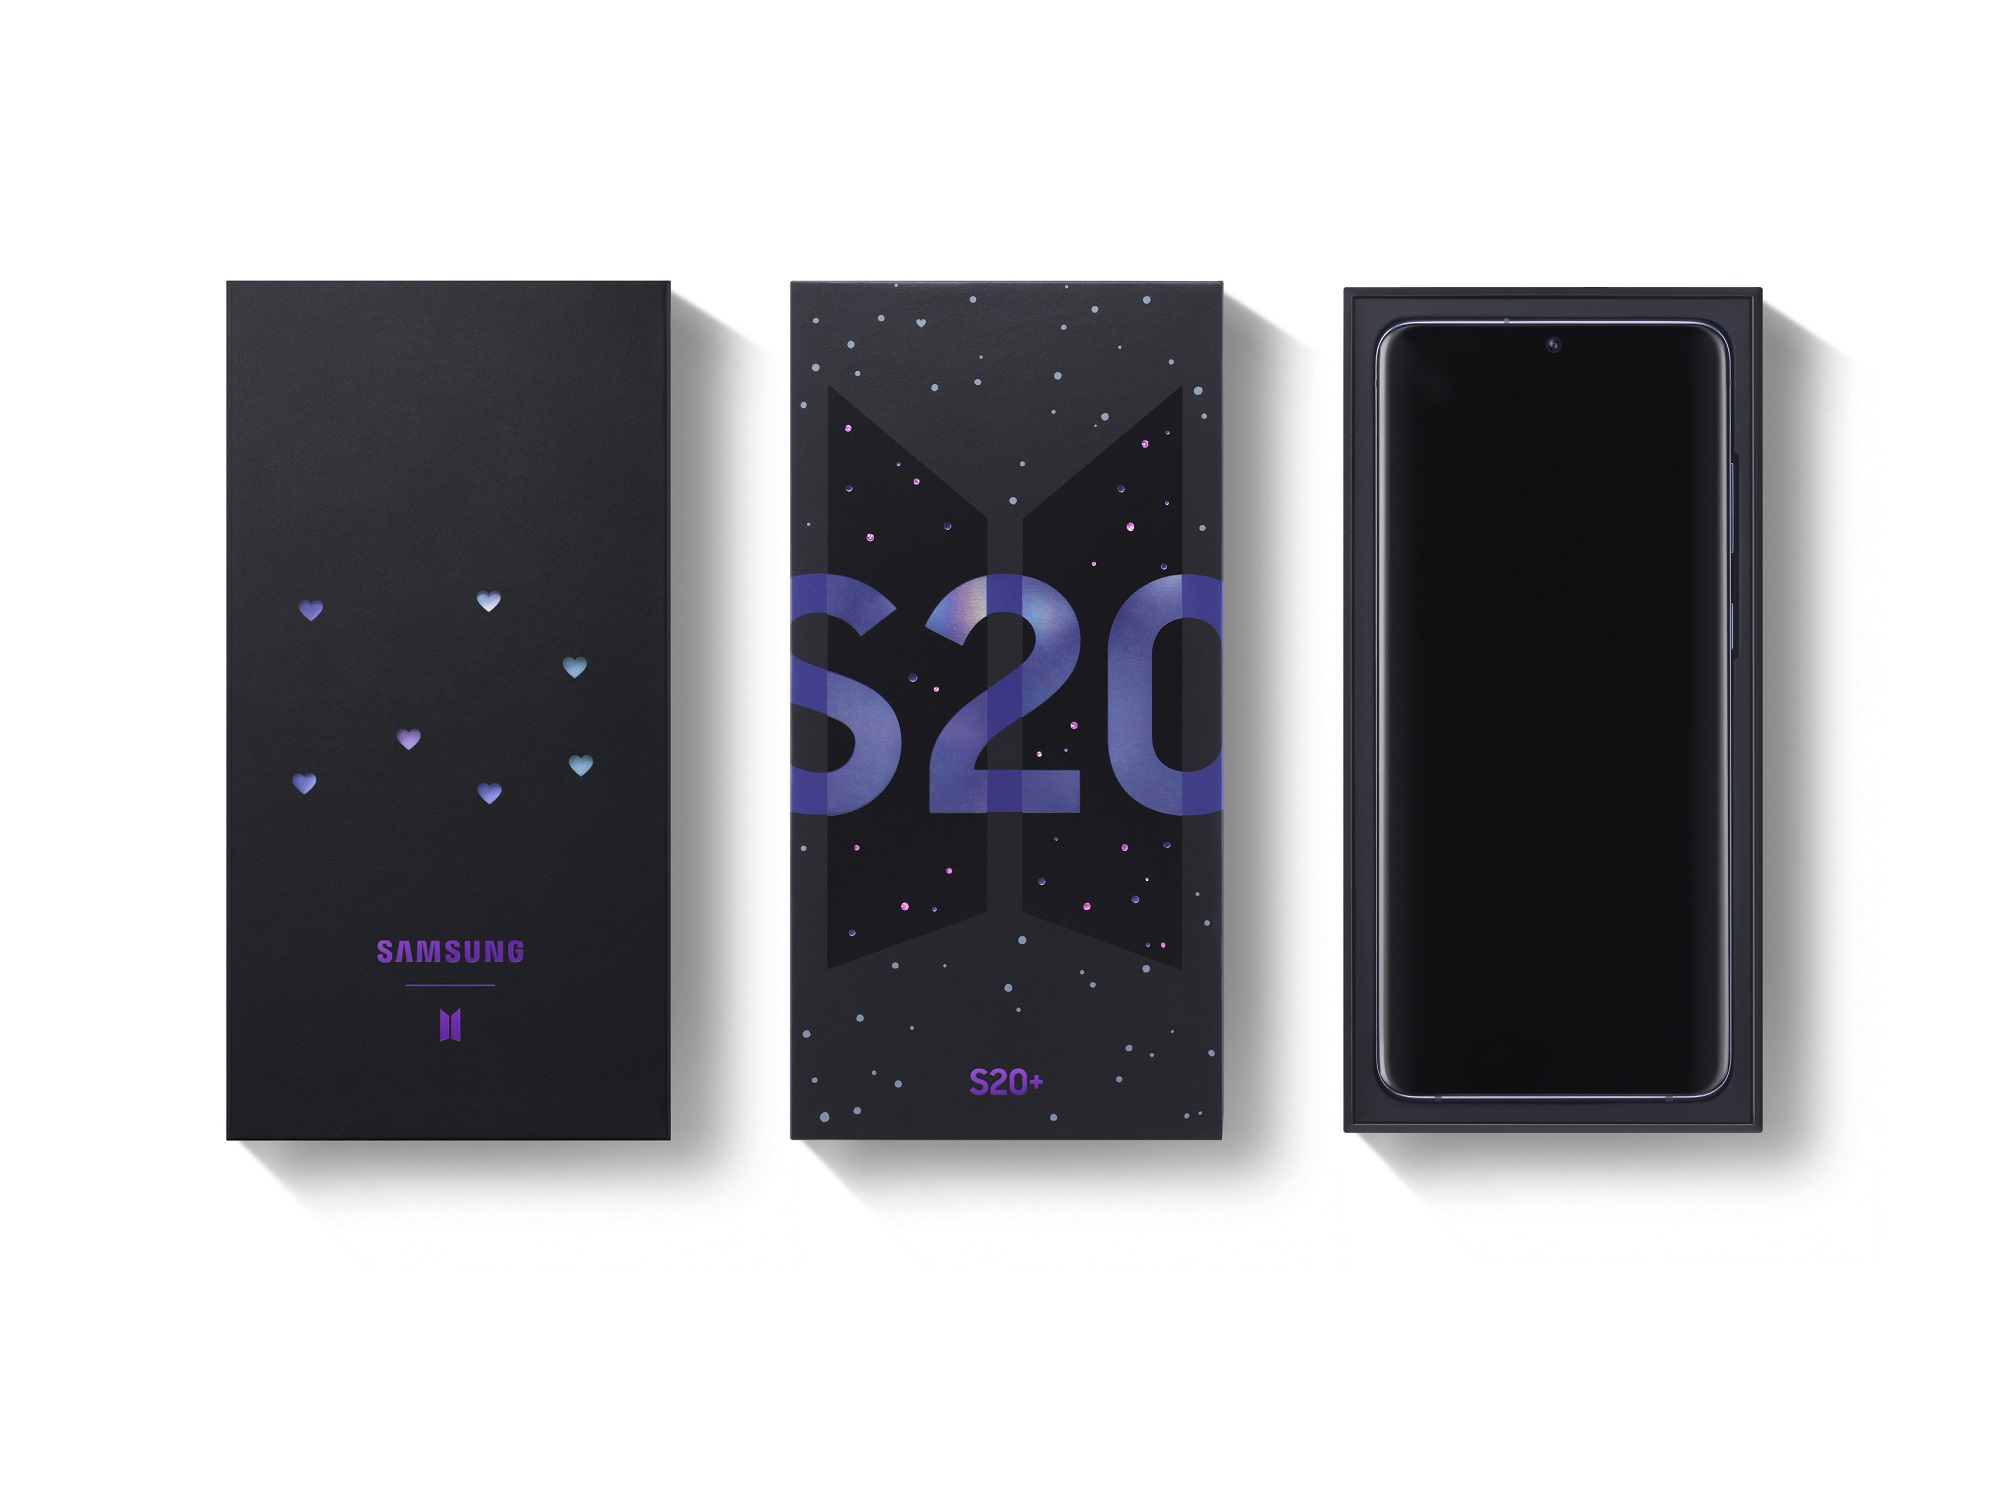 Samsung Galaxy S20+ BTS Edition smartphone